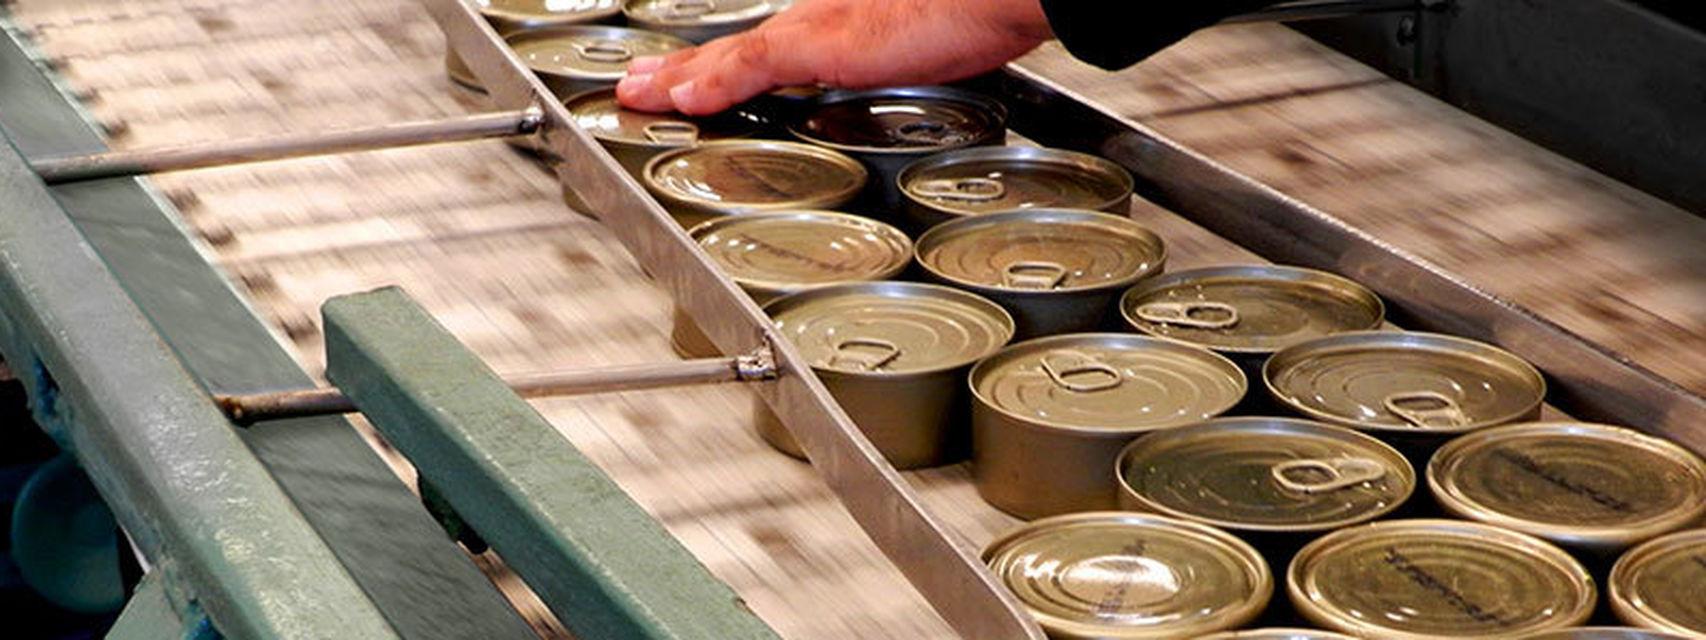 Profeco alerta sobre marcas venden soya en lugar de atún